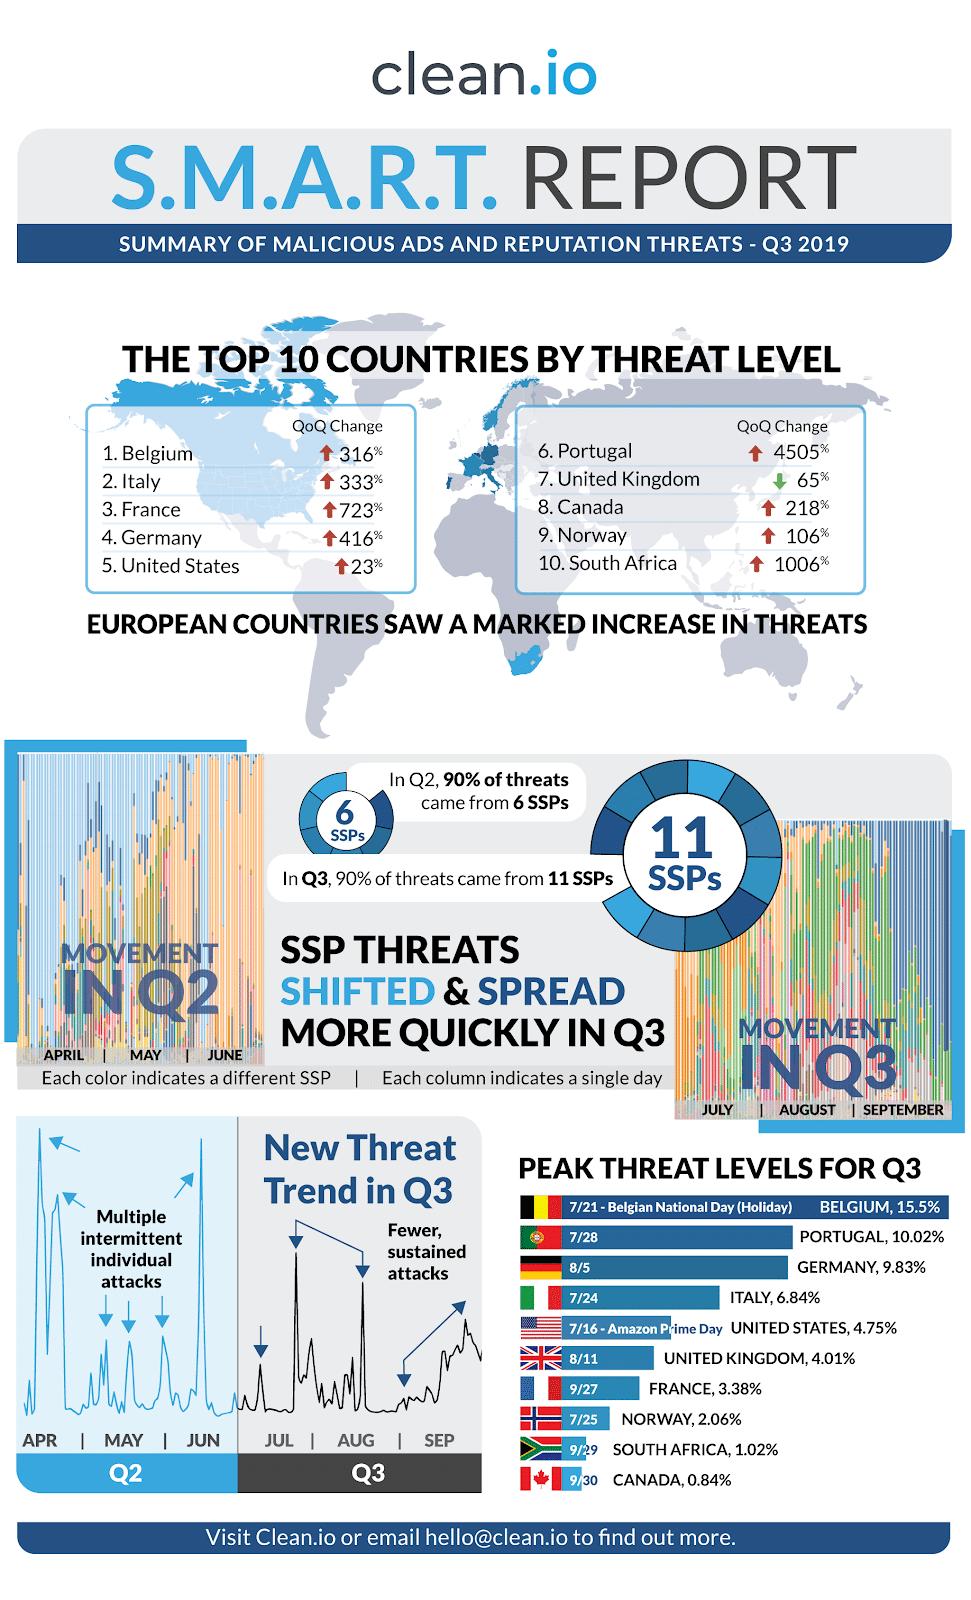 malicious-reputation-threat-q3_2019-infographic